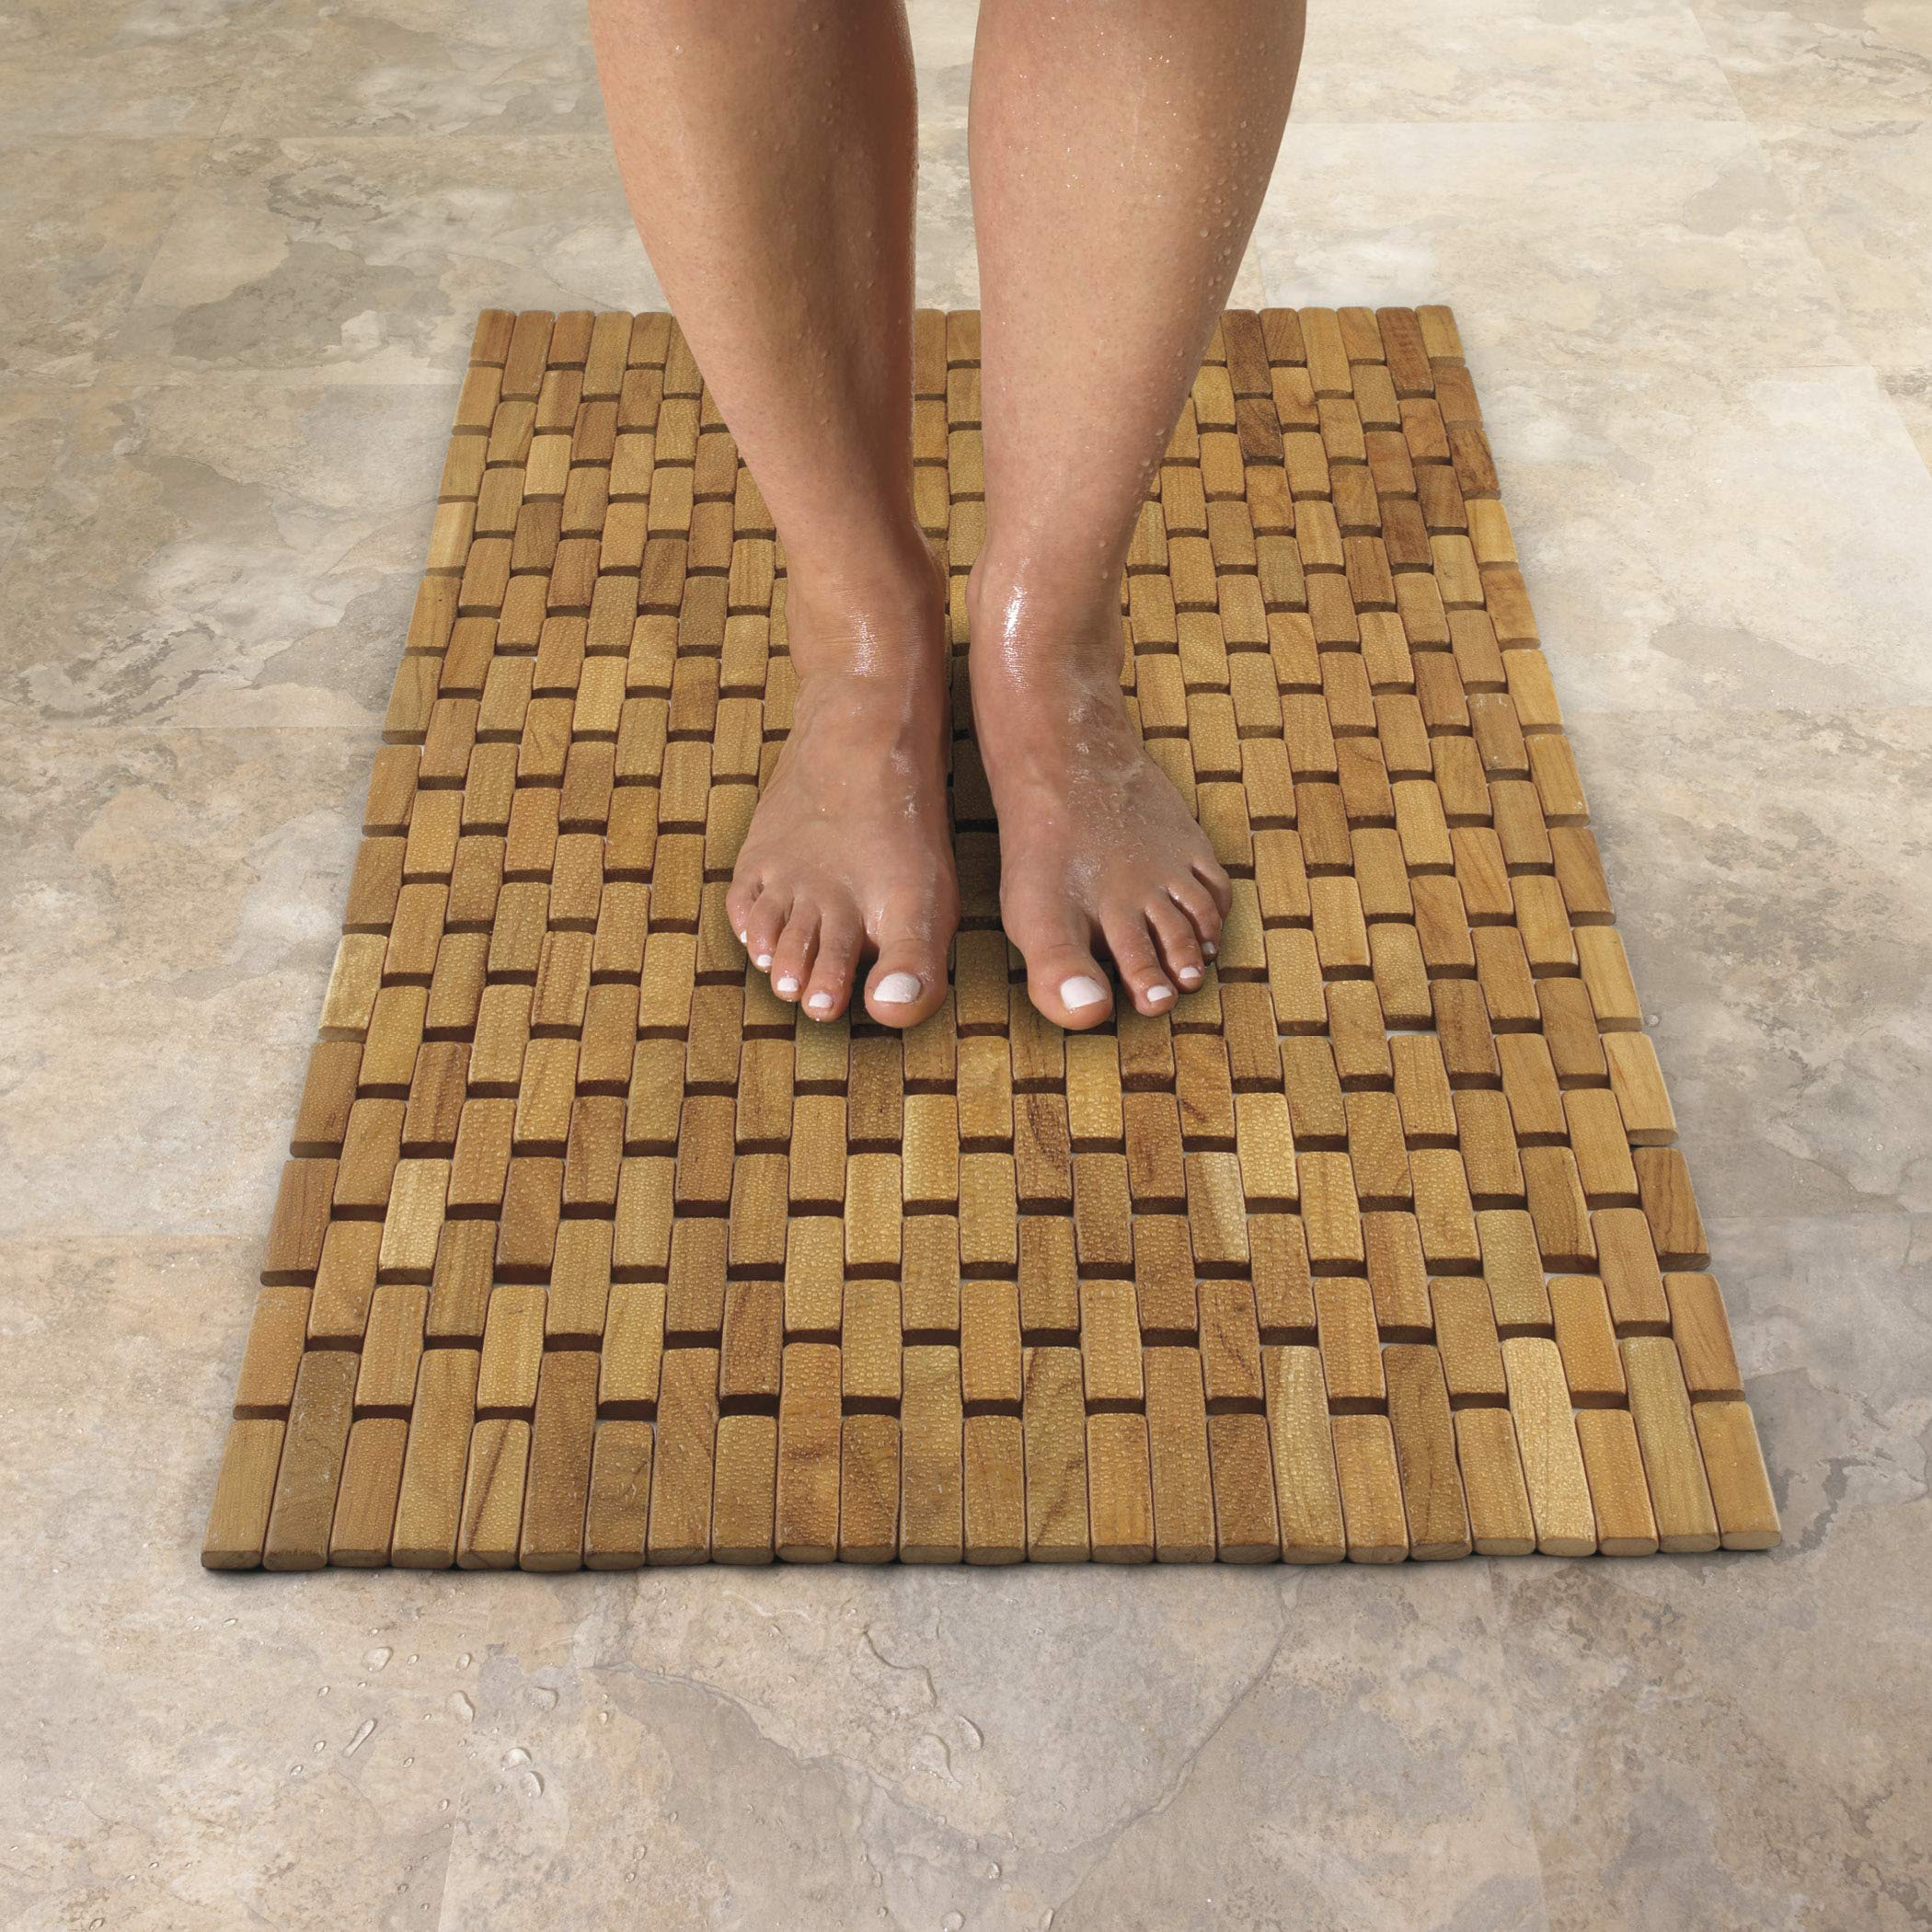 Conair Home Teak Spa Mat, Roll-Up or Lay Flat by Conair (Image #3)